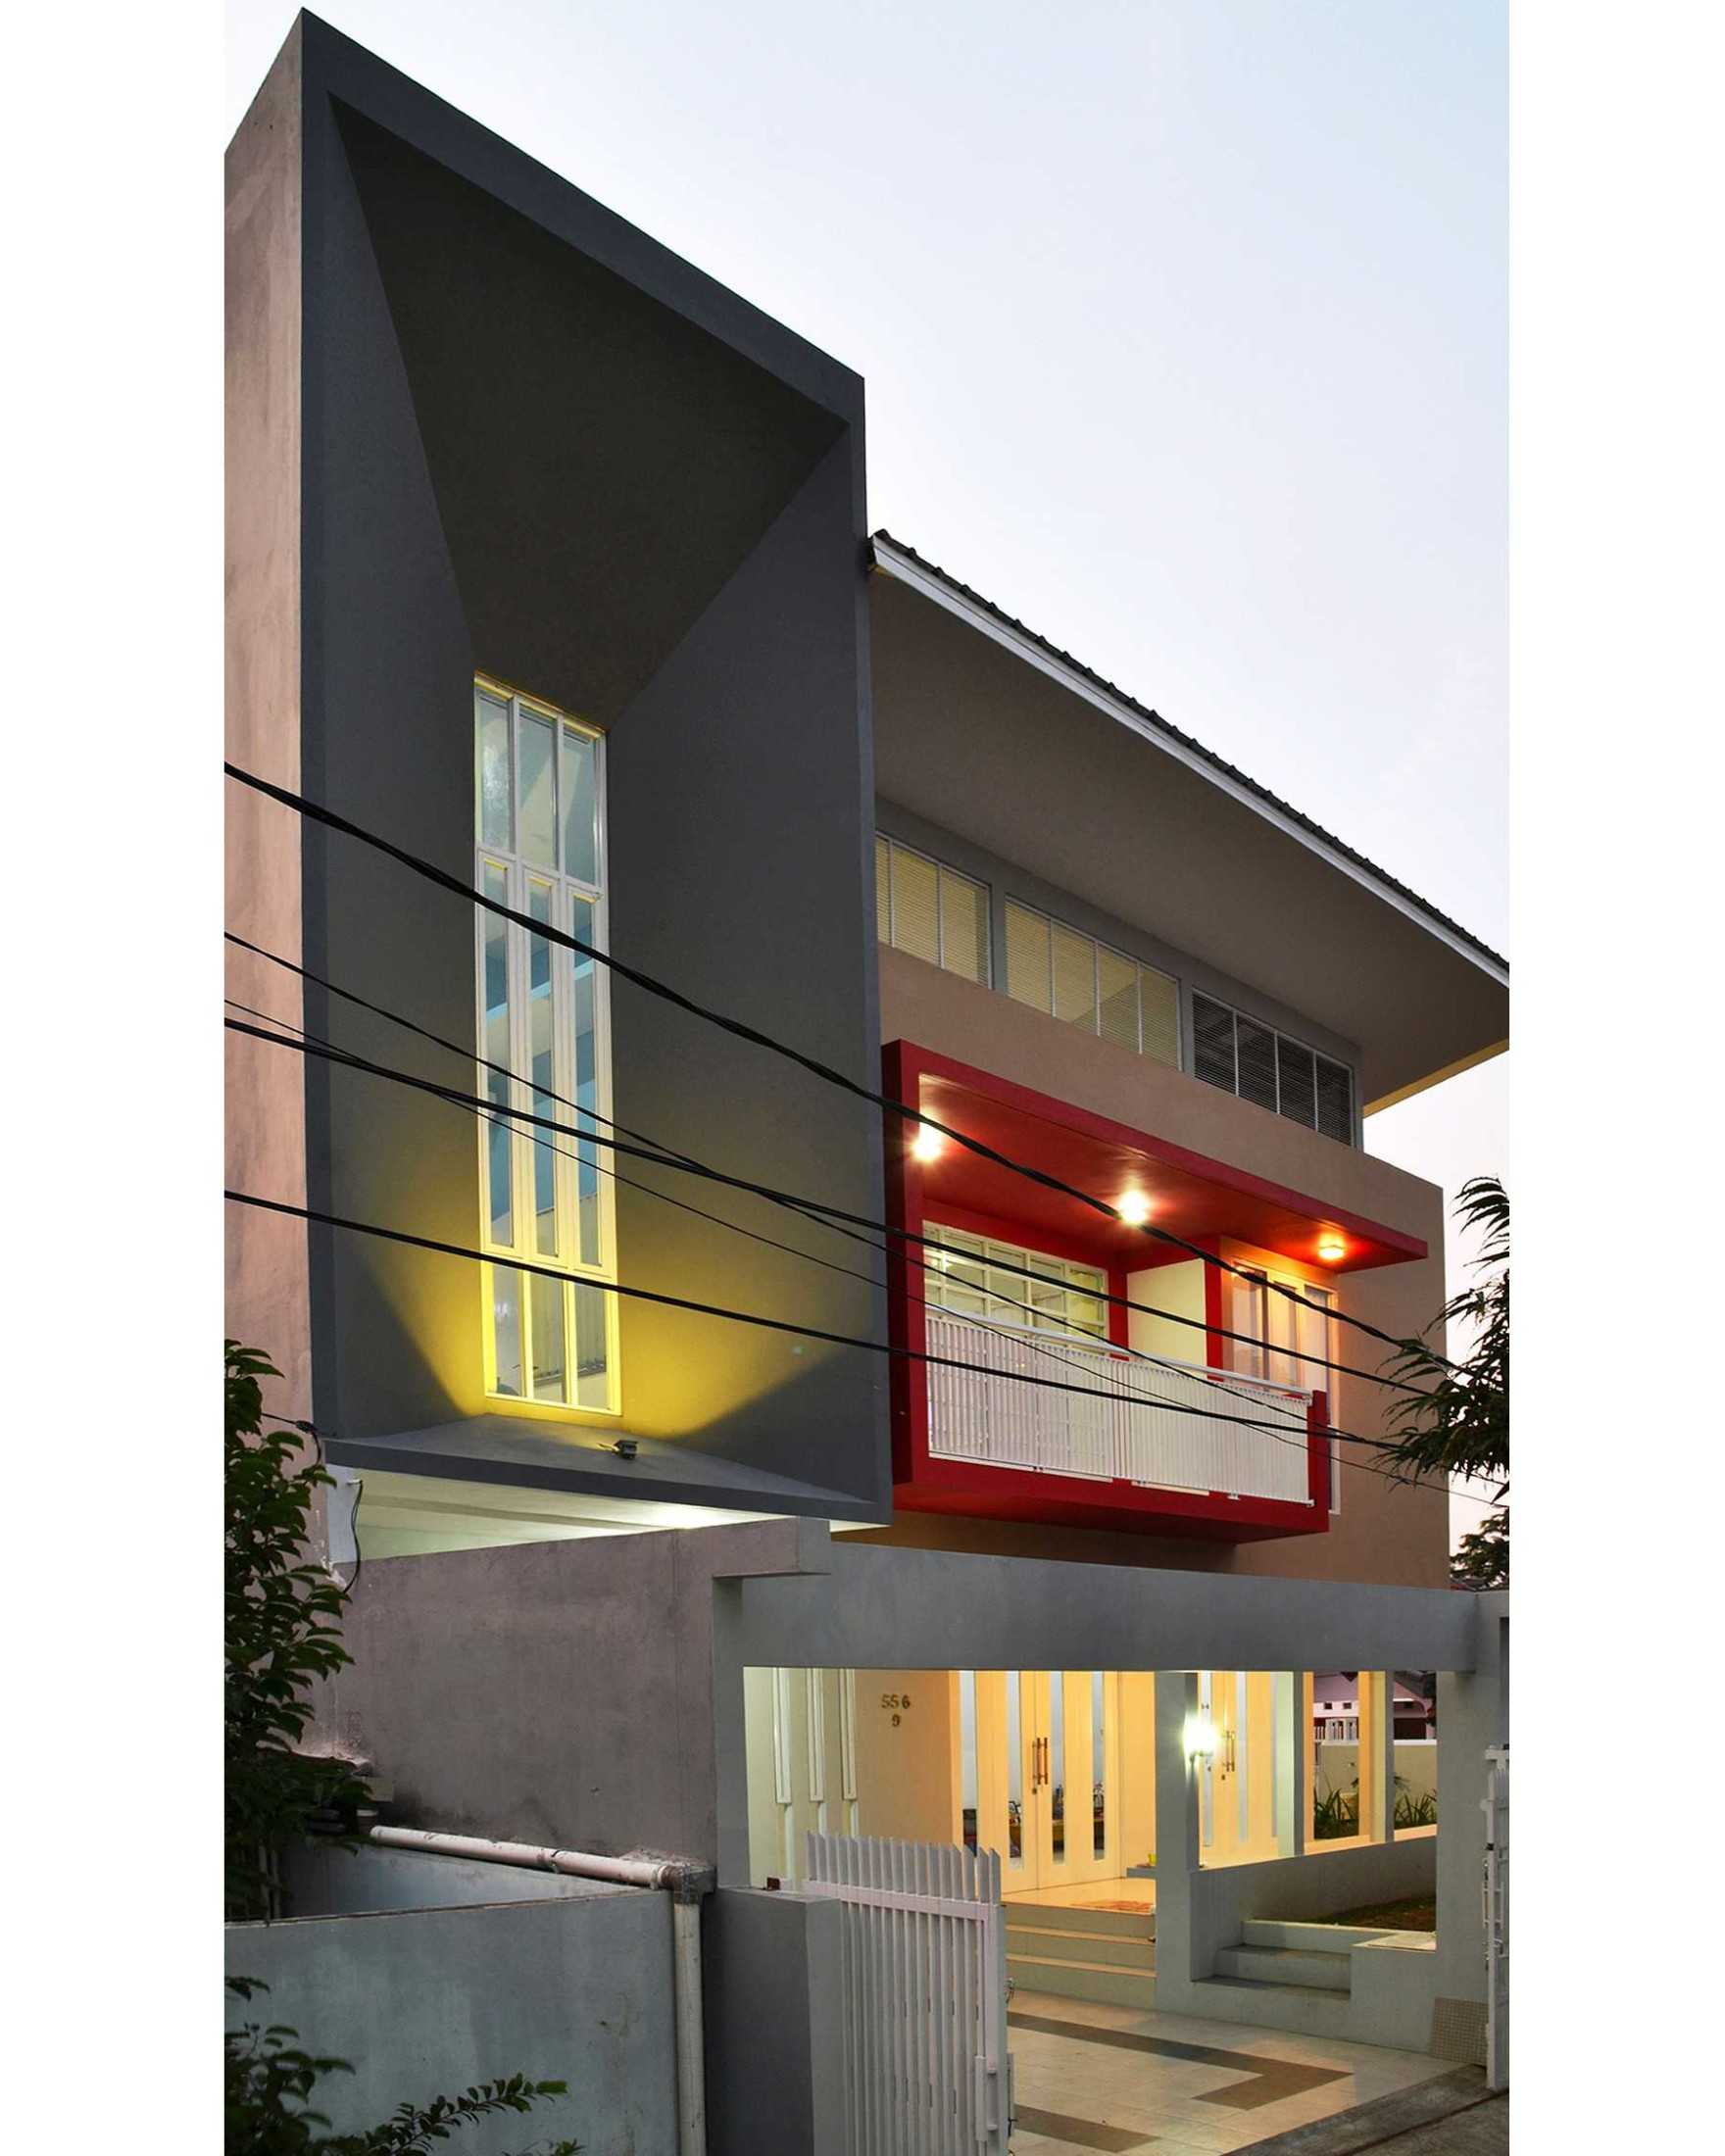 Arsitek Pramudya Rumah Bintara Bintara, Kec. Bekasi Bar., Kota Bks, Jawa Barat, Indonesia Bintara, Kec. Bekasi Bar., Kota Bks, Jawa Barat, Indonesia Arsitek-Pramudya-Rumah-Bintara  96764